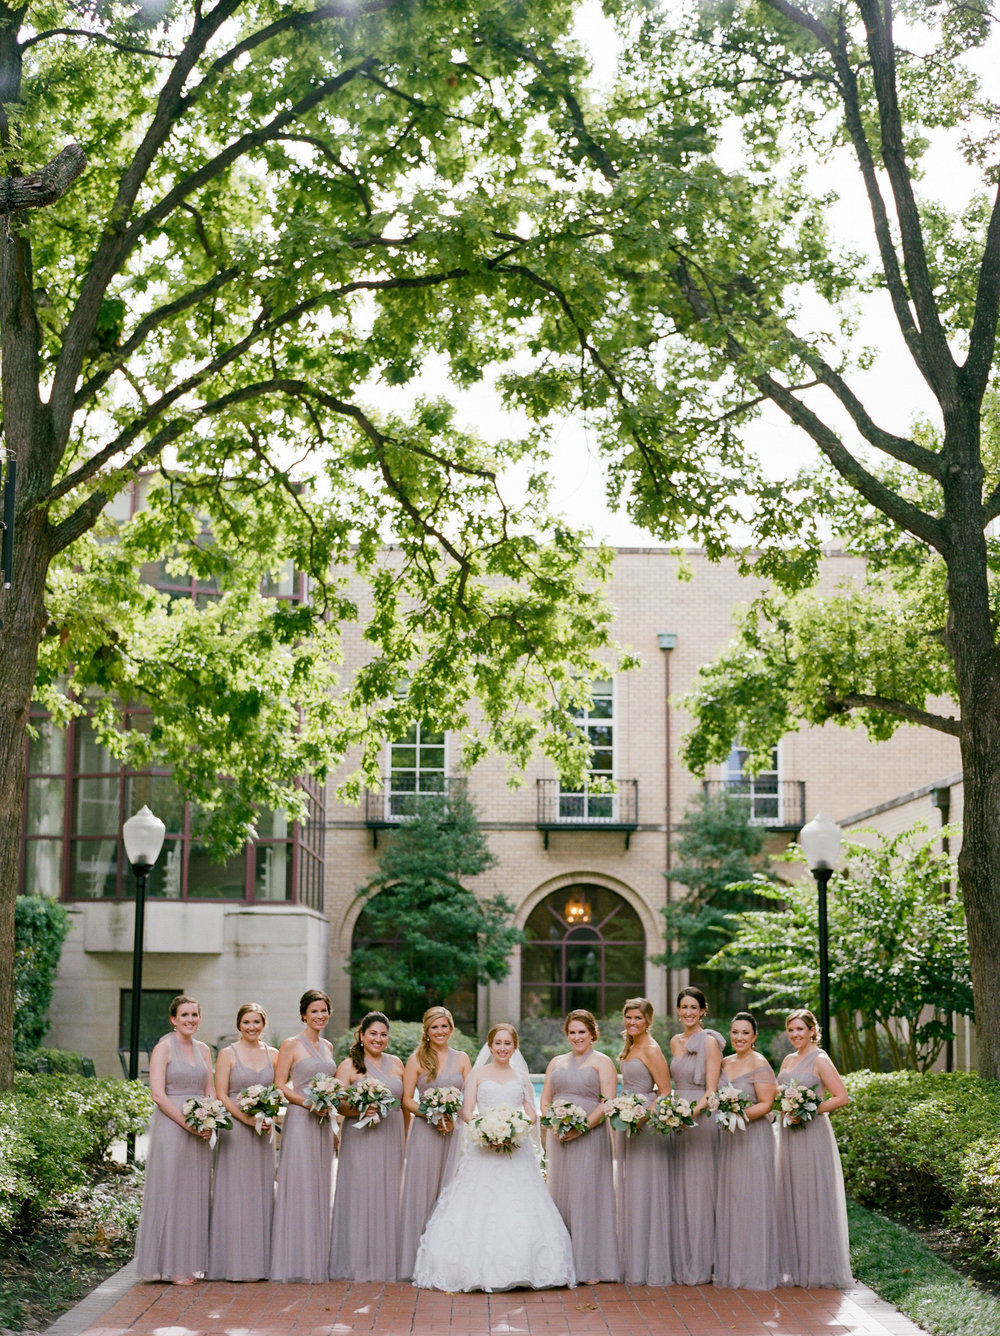 houston-wedding-planner-fine-art-luxury-designer-top-best-destination-austin-dallas-kelly-doonan-events-river-oaks-country-club-17